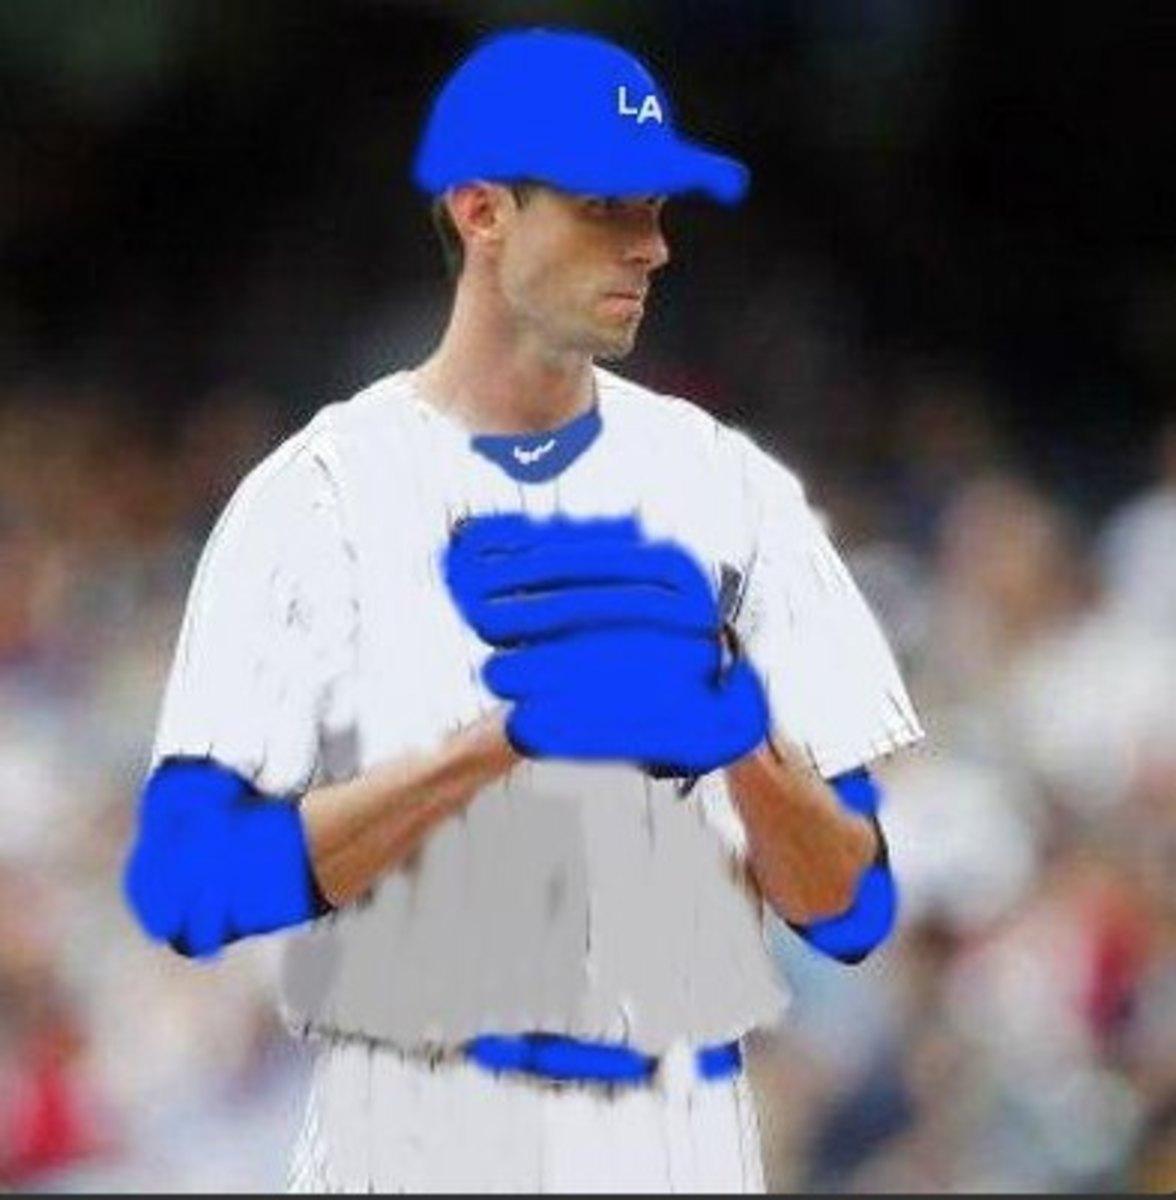 Los-Angeles-Dodgers-Brandon-McCarthy-twitter-picture.jpg